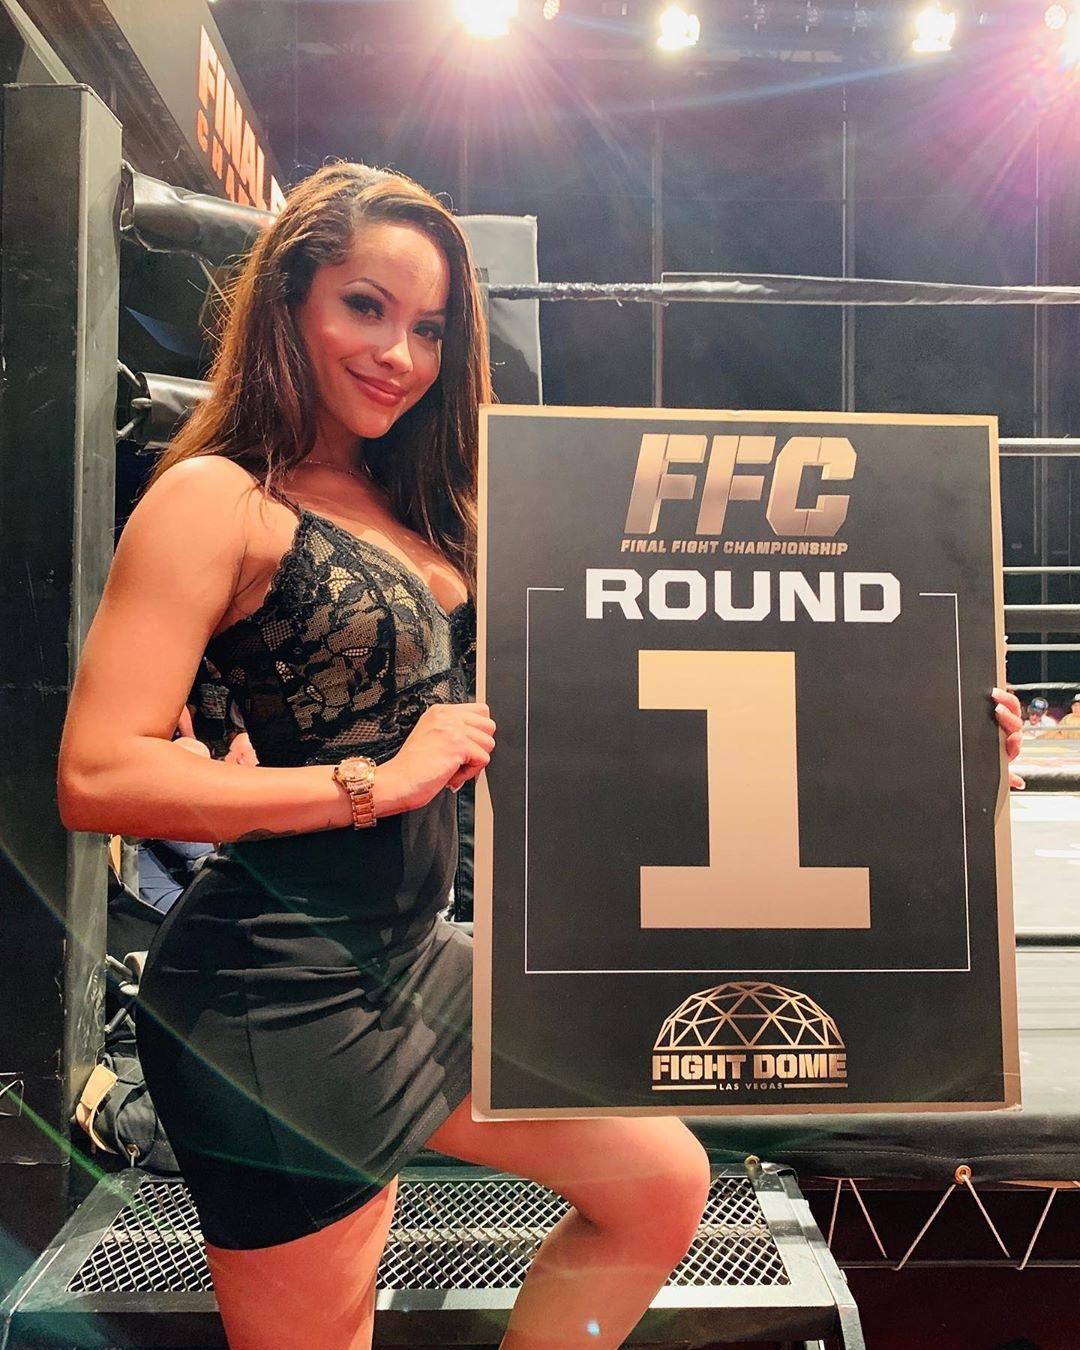 FFC ring djevojka Tiara Michelle (Instagram)